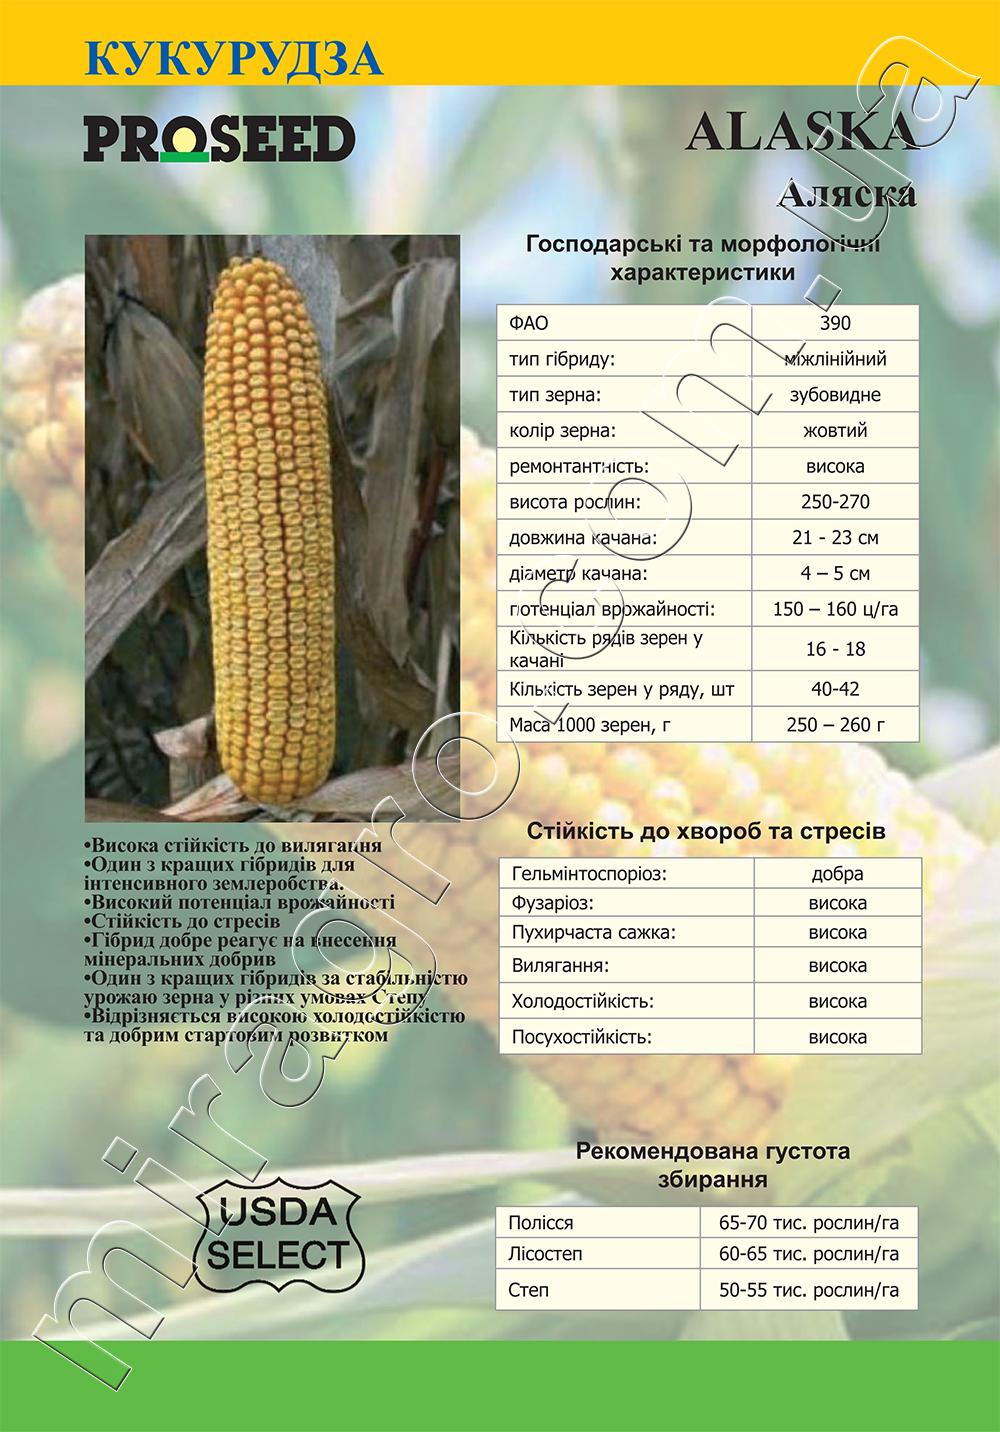 Гибрид кукурузы Аляска (Alaska) - описание каталог